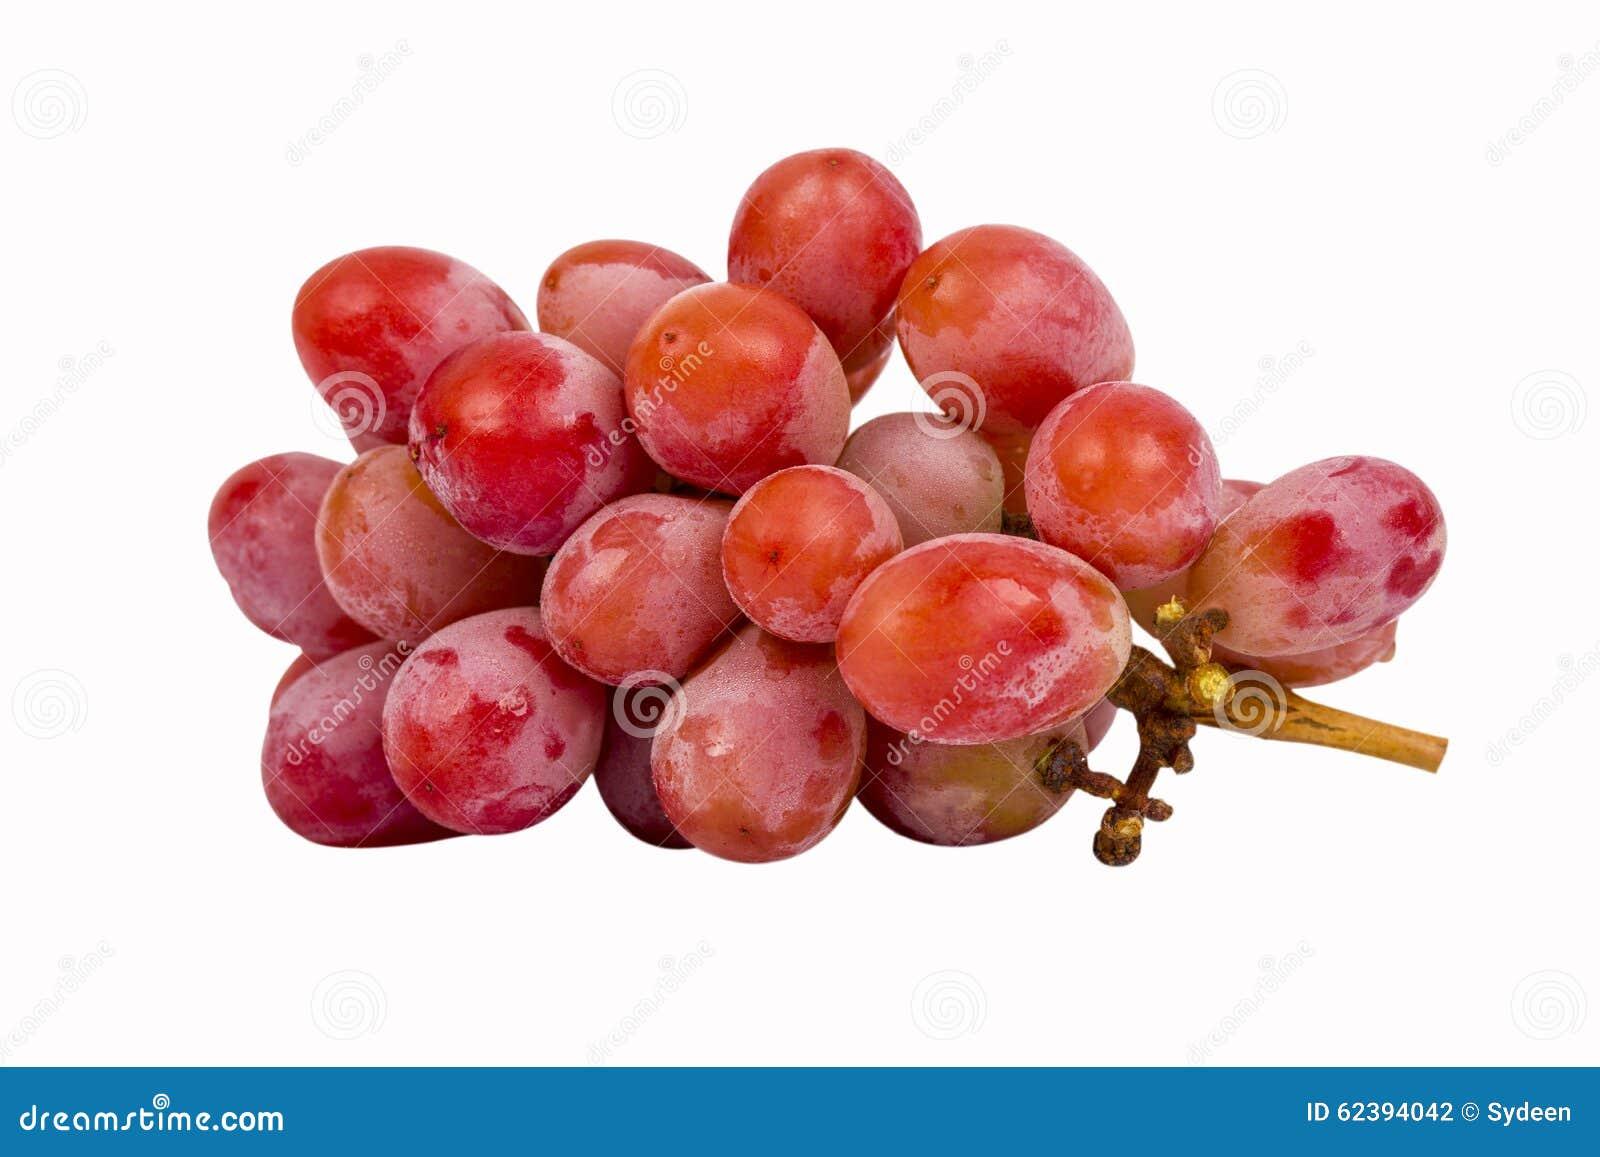 Seedless red grape